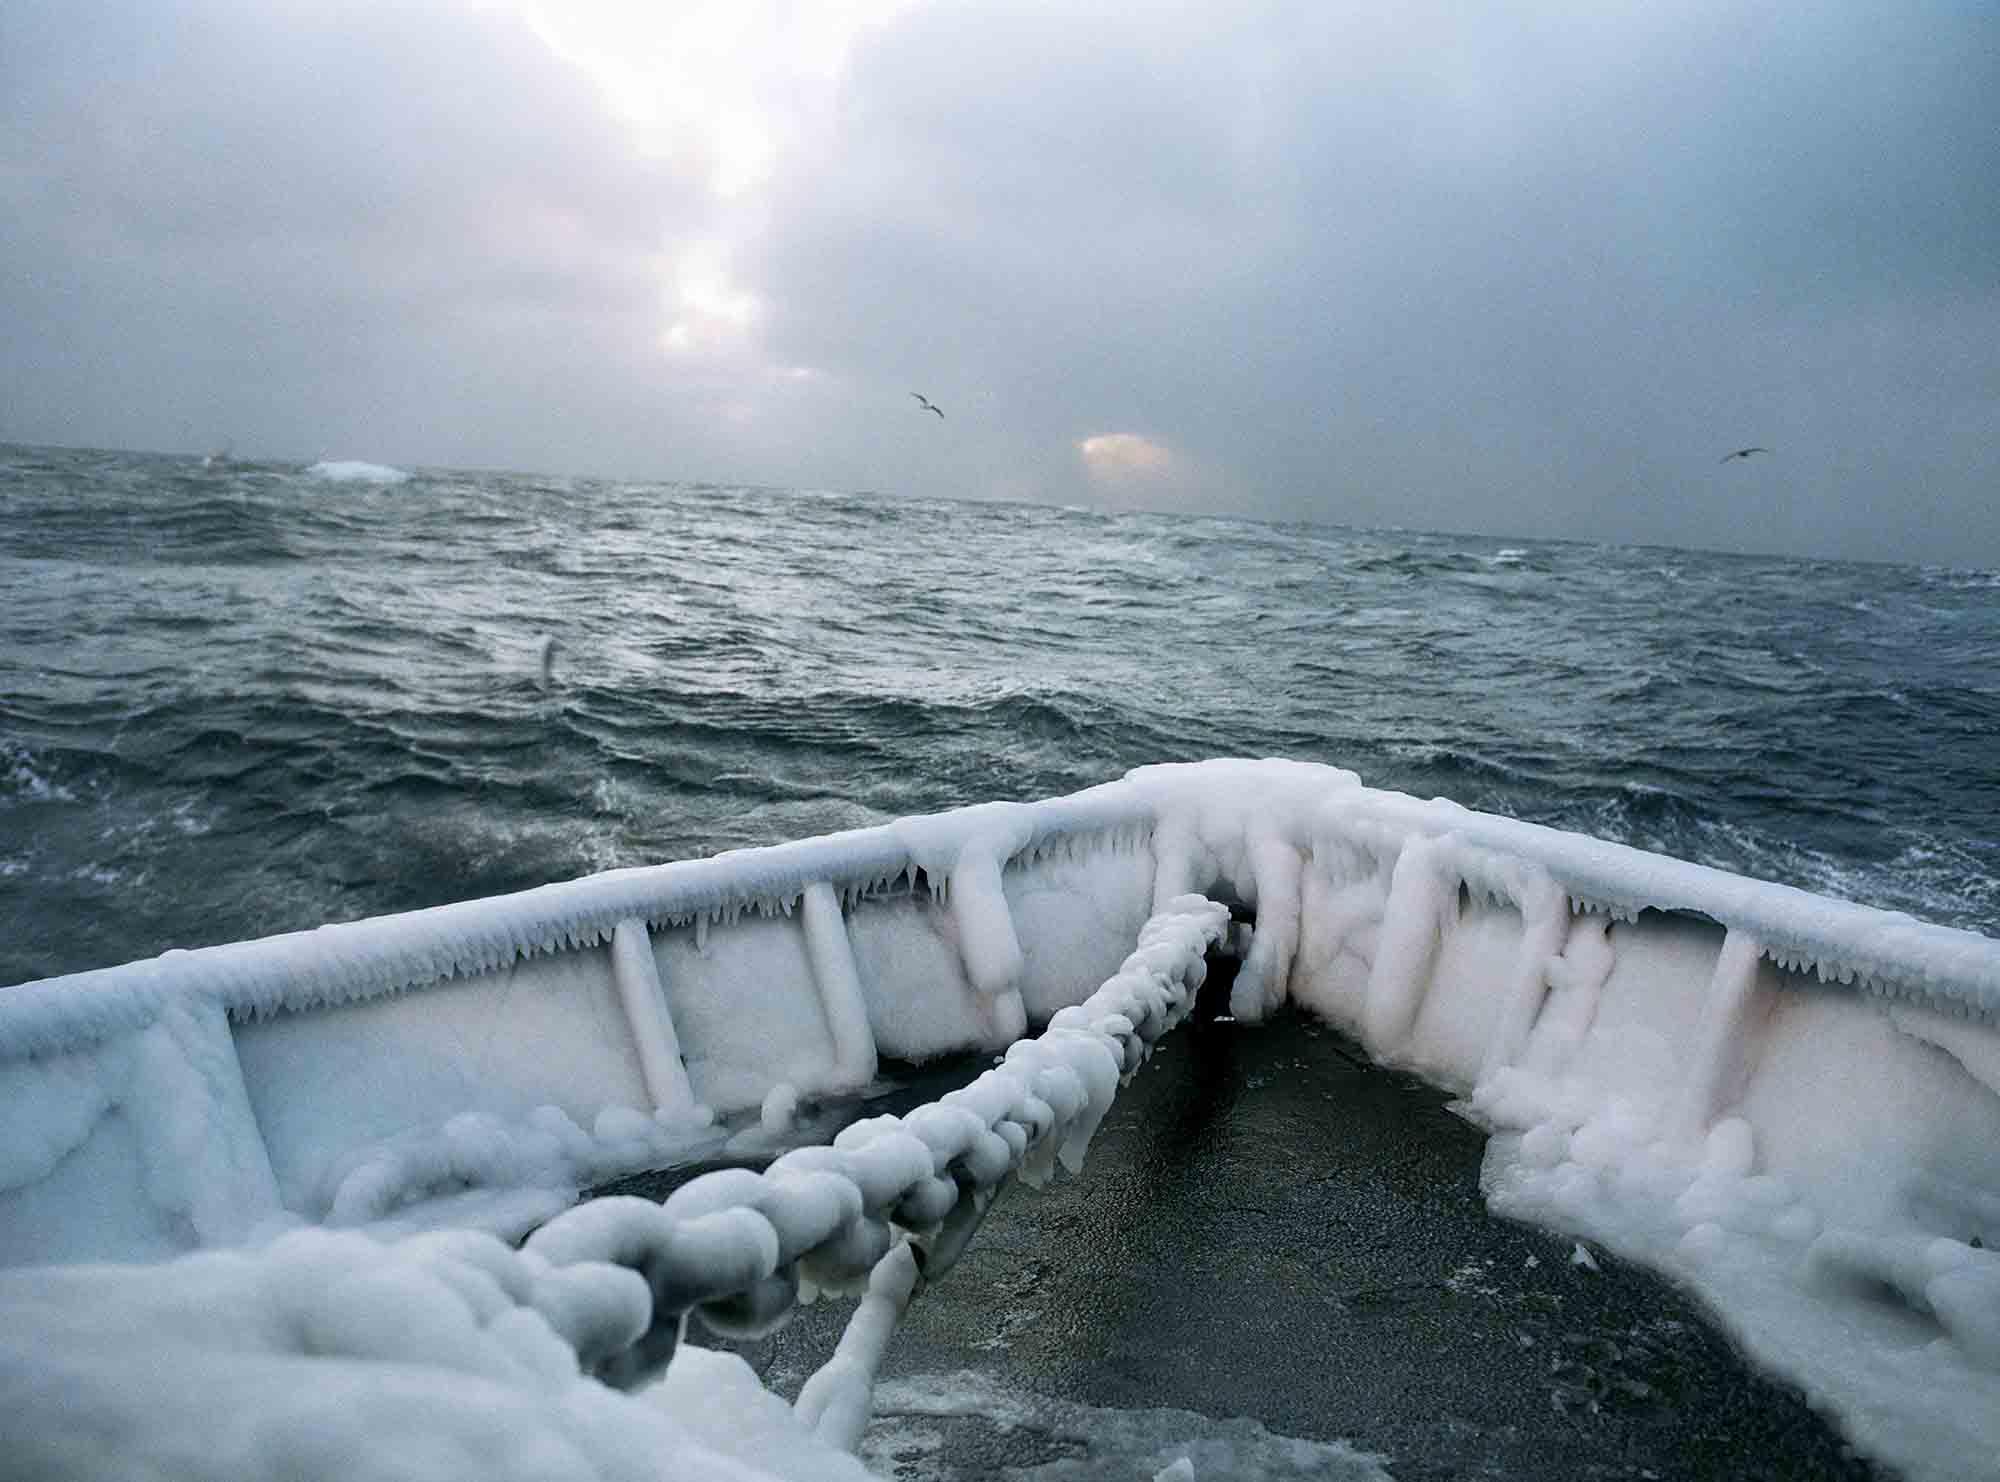 Ocean Spirit – Corey Arnold, Icy Bow